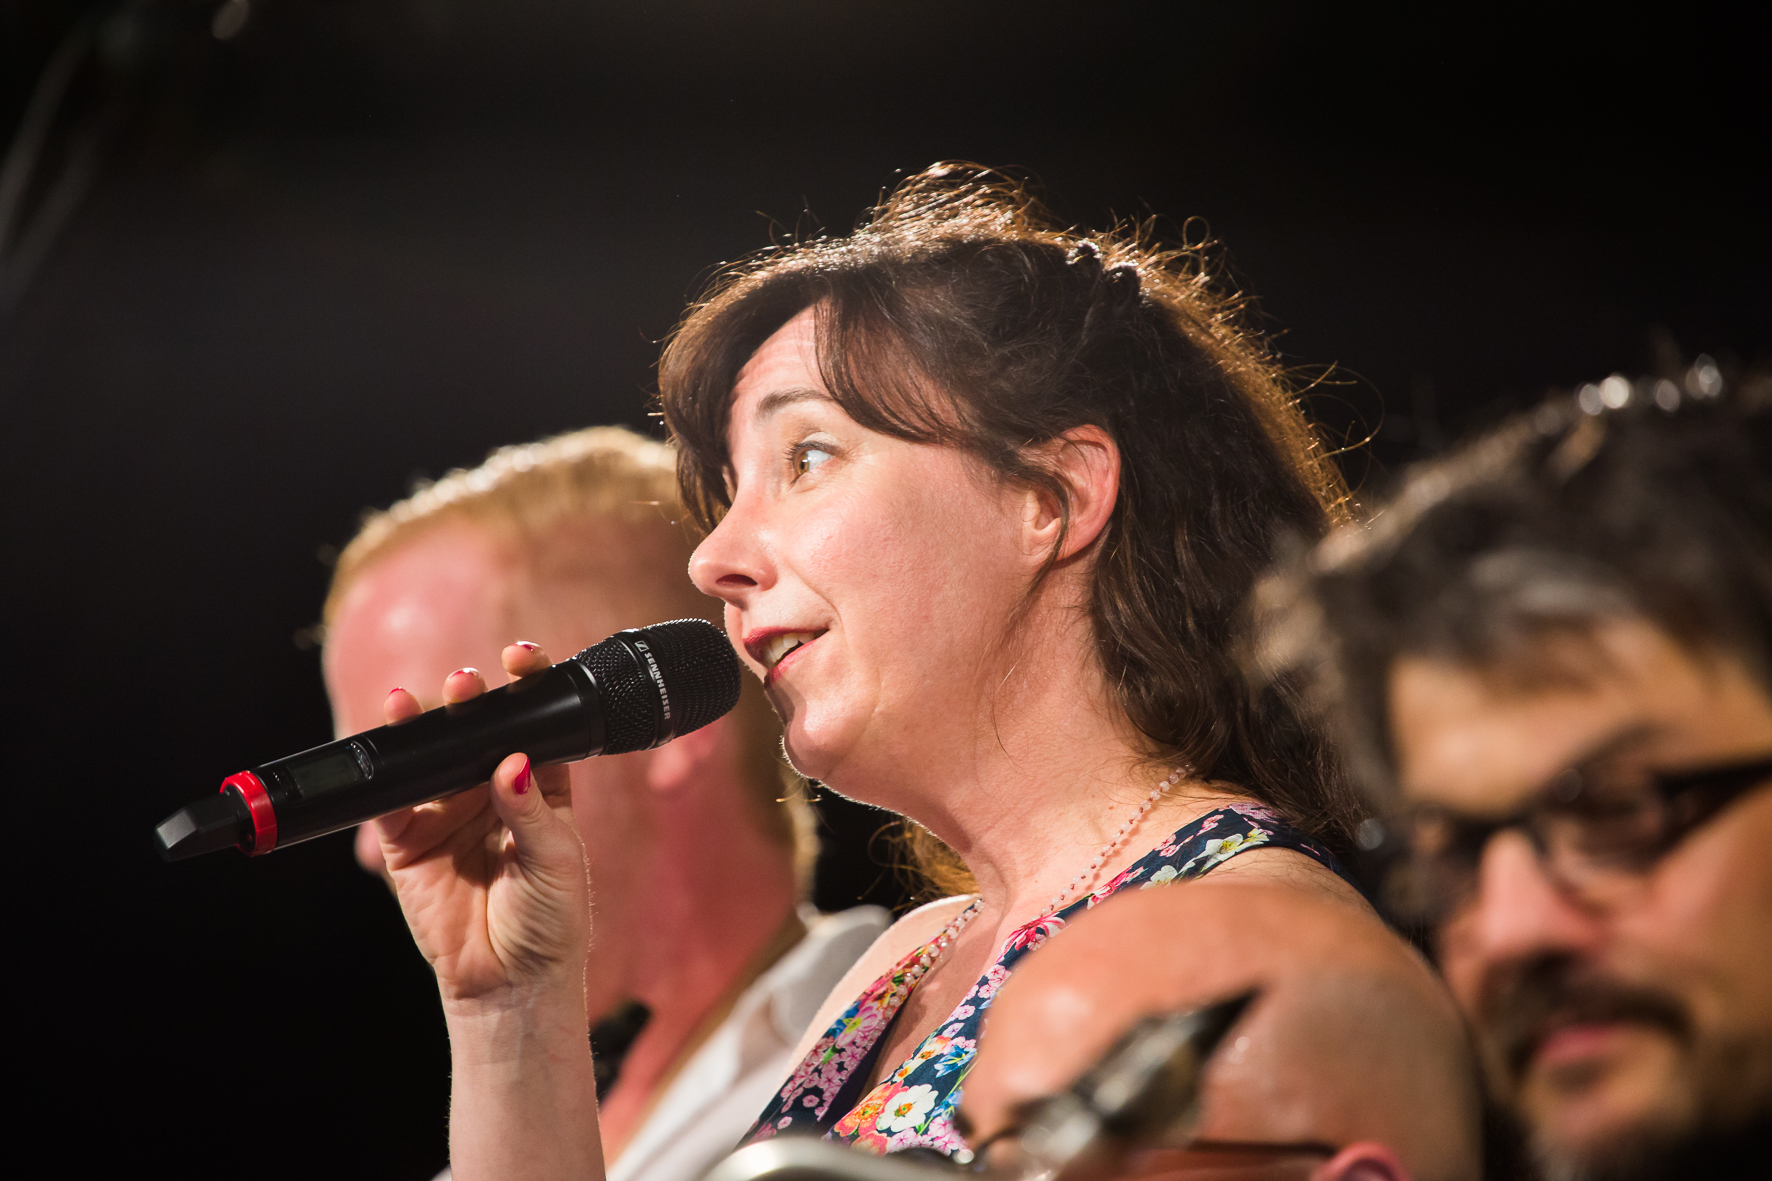 Claudia Burghard